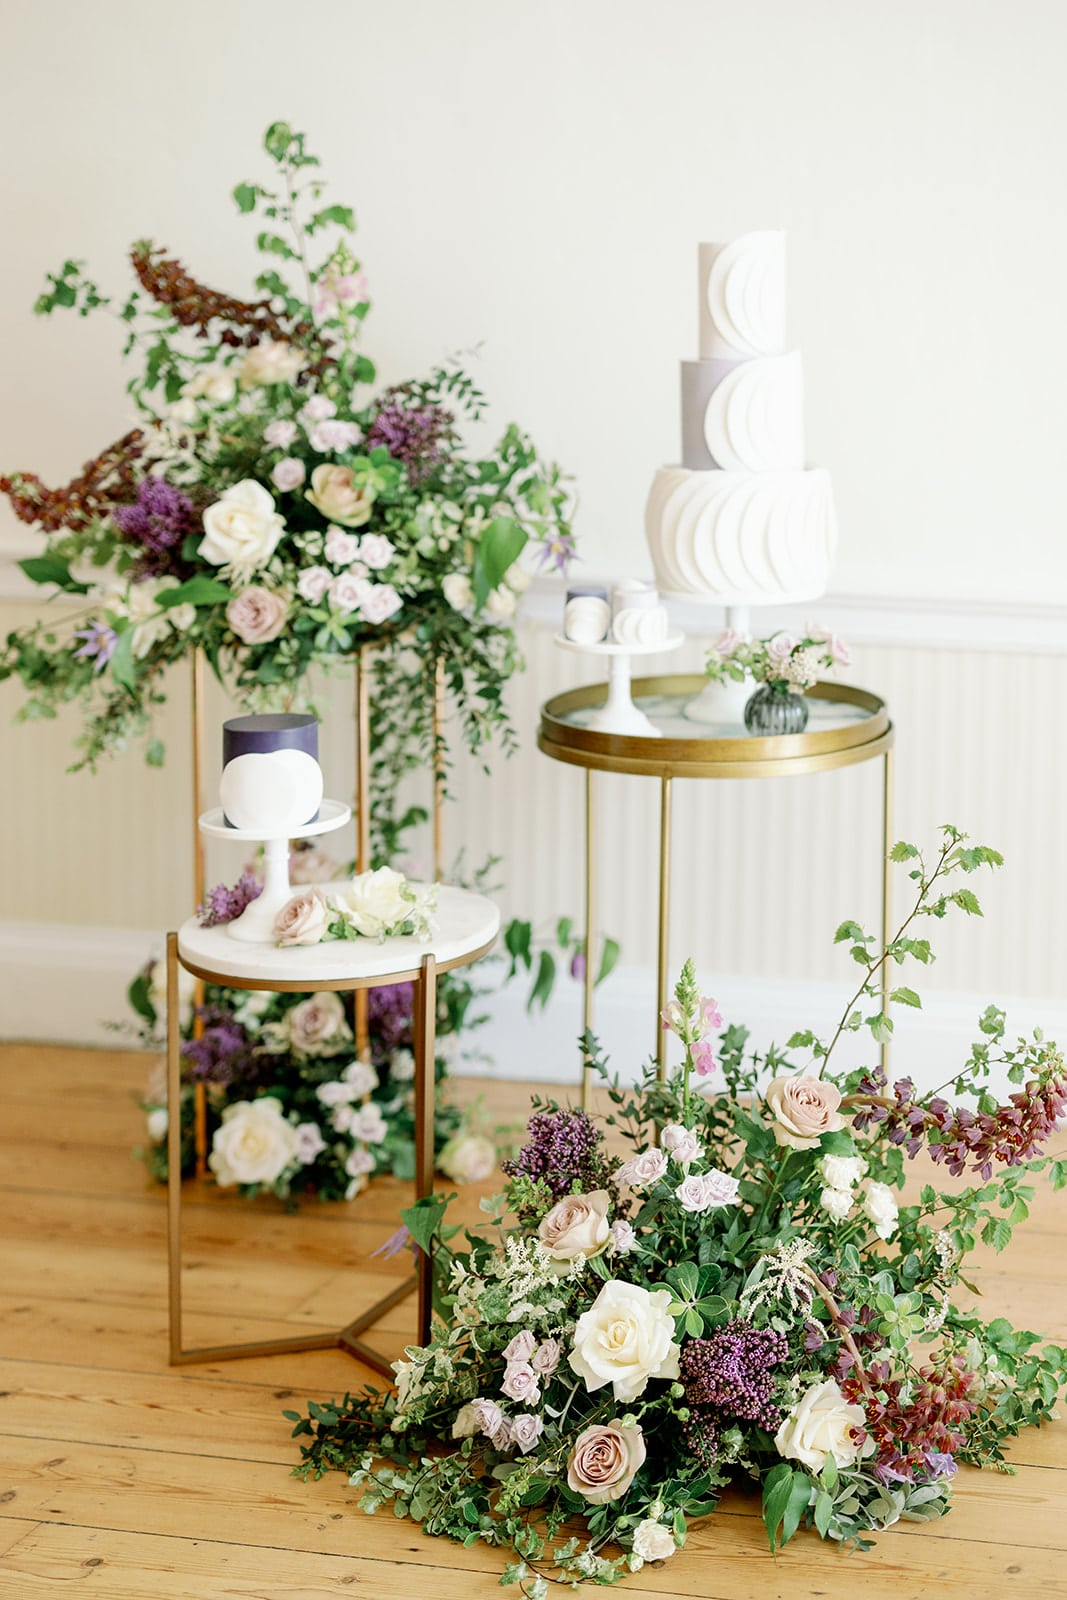 Lewes wedding photography of Iced Innovations wedding cake